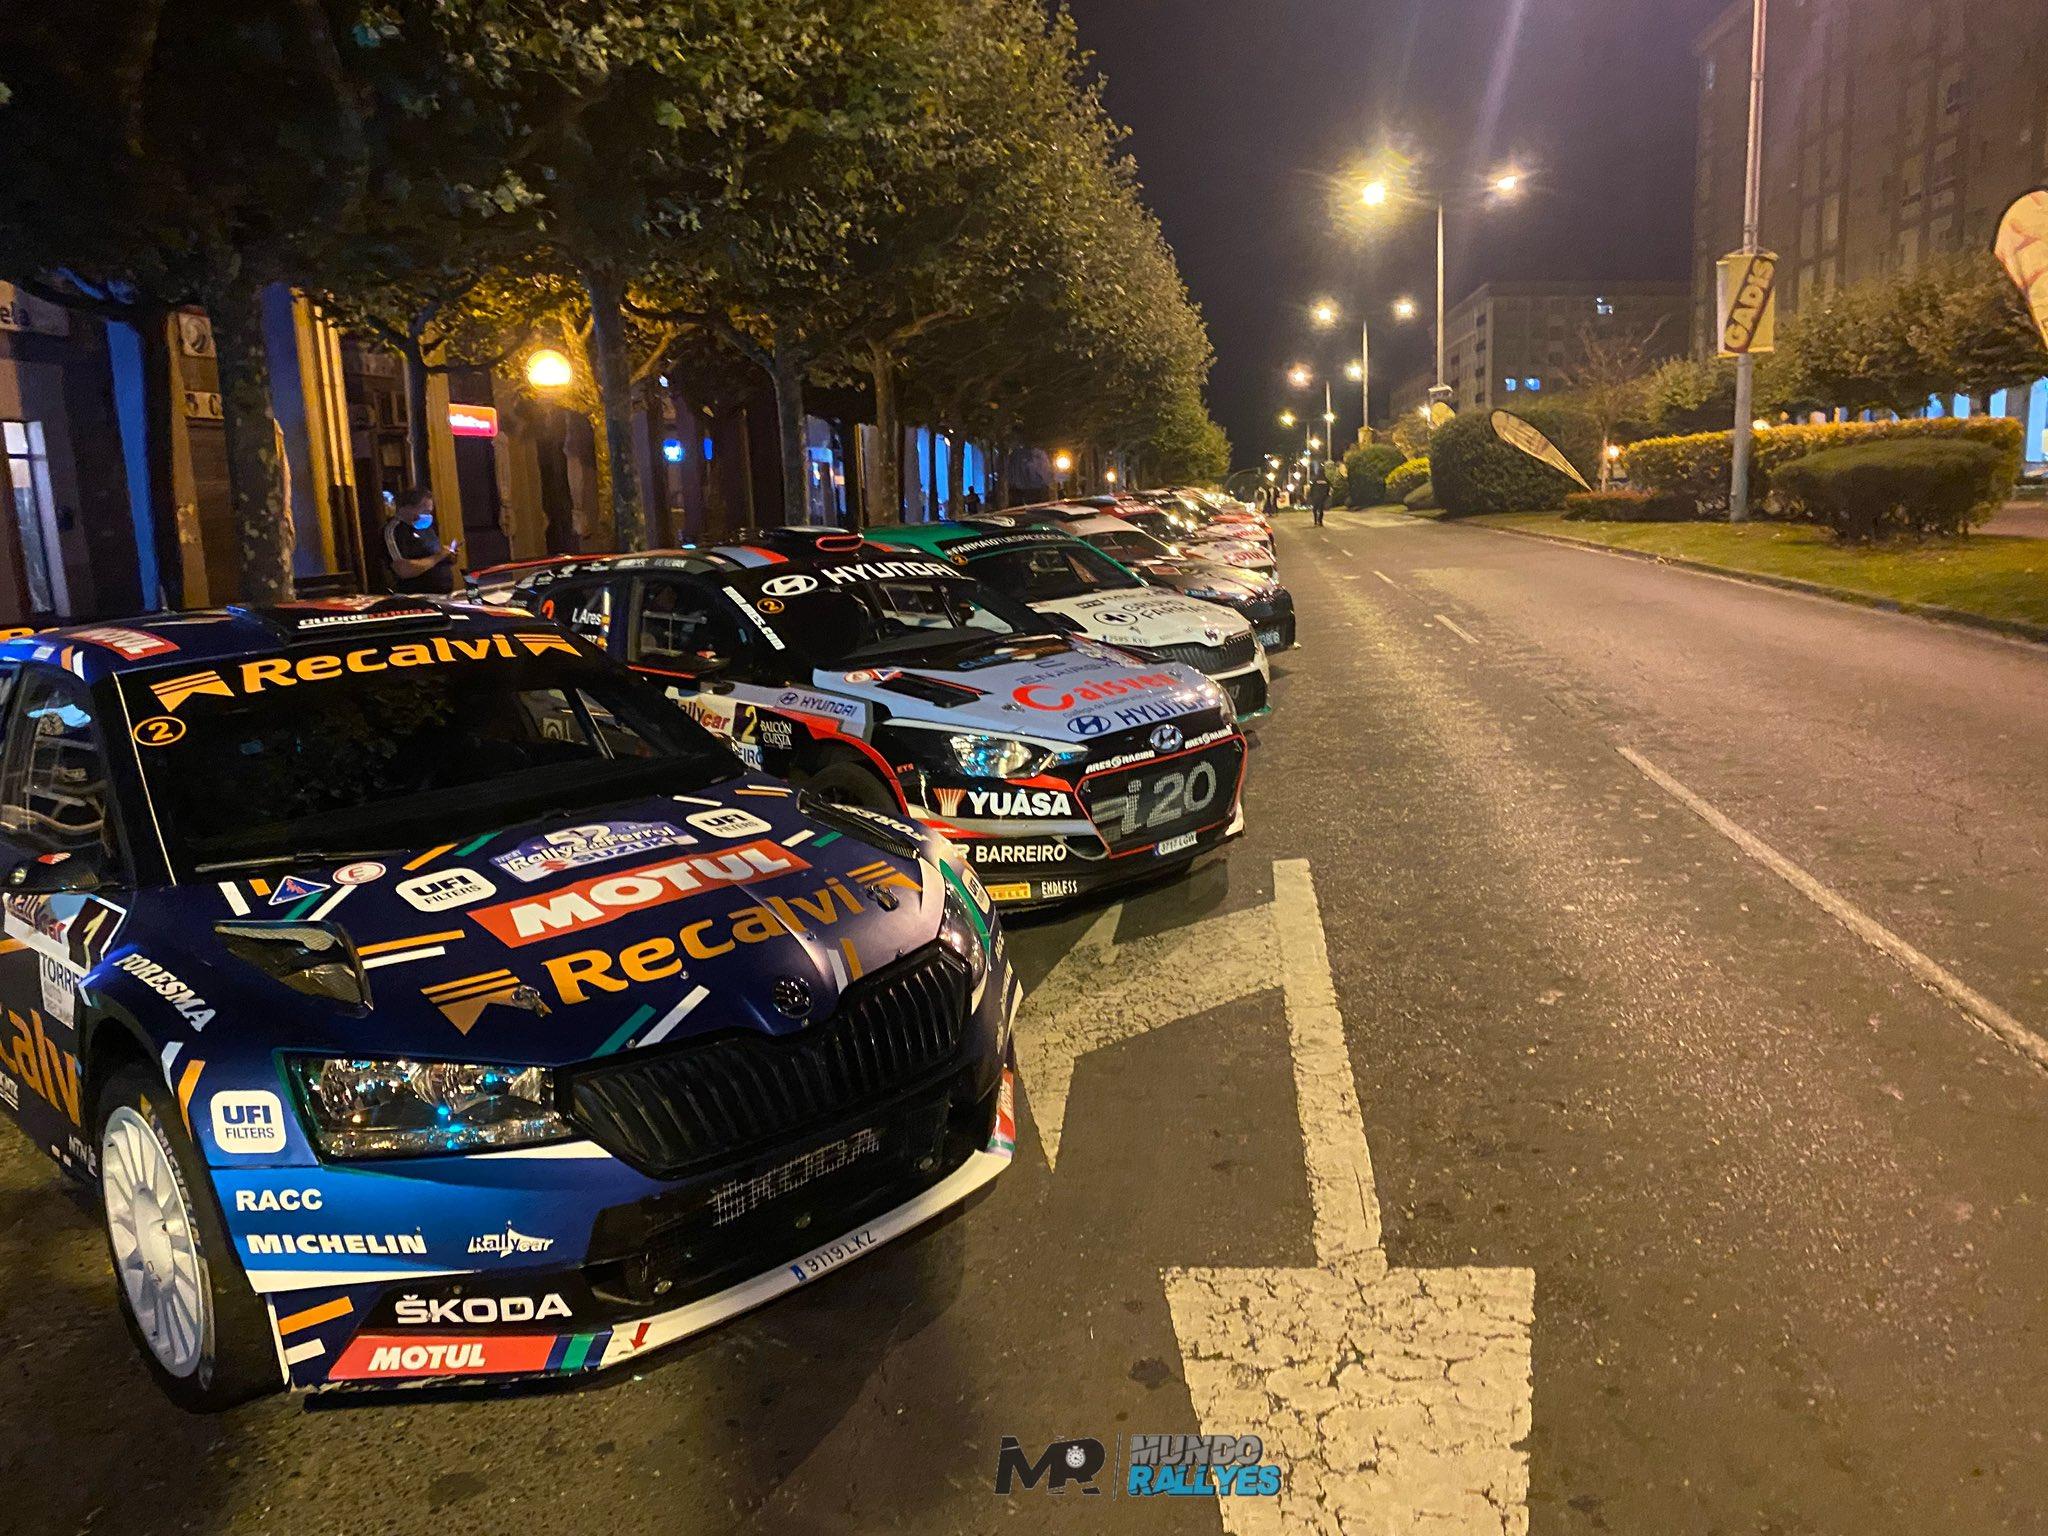 SCER + TER: 52º Rallye de Ferrol - Suzuki [20-21 Agosto] - Página 2 E9RKJQmXMAIJ4nN?format=jpg&name=large